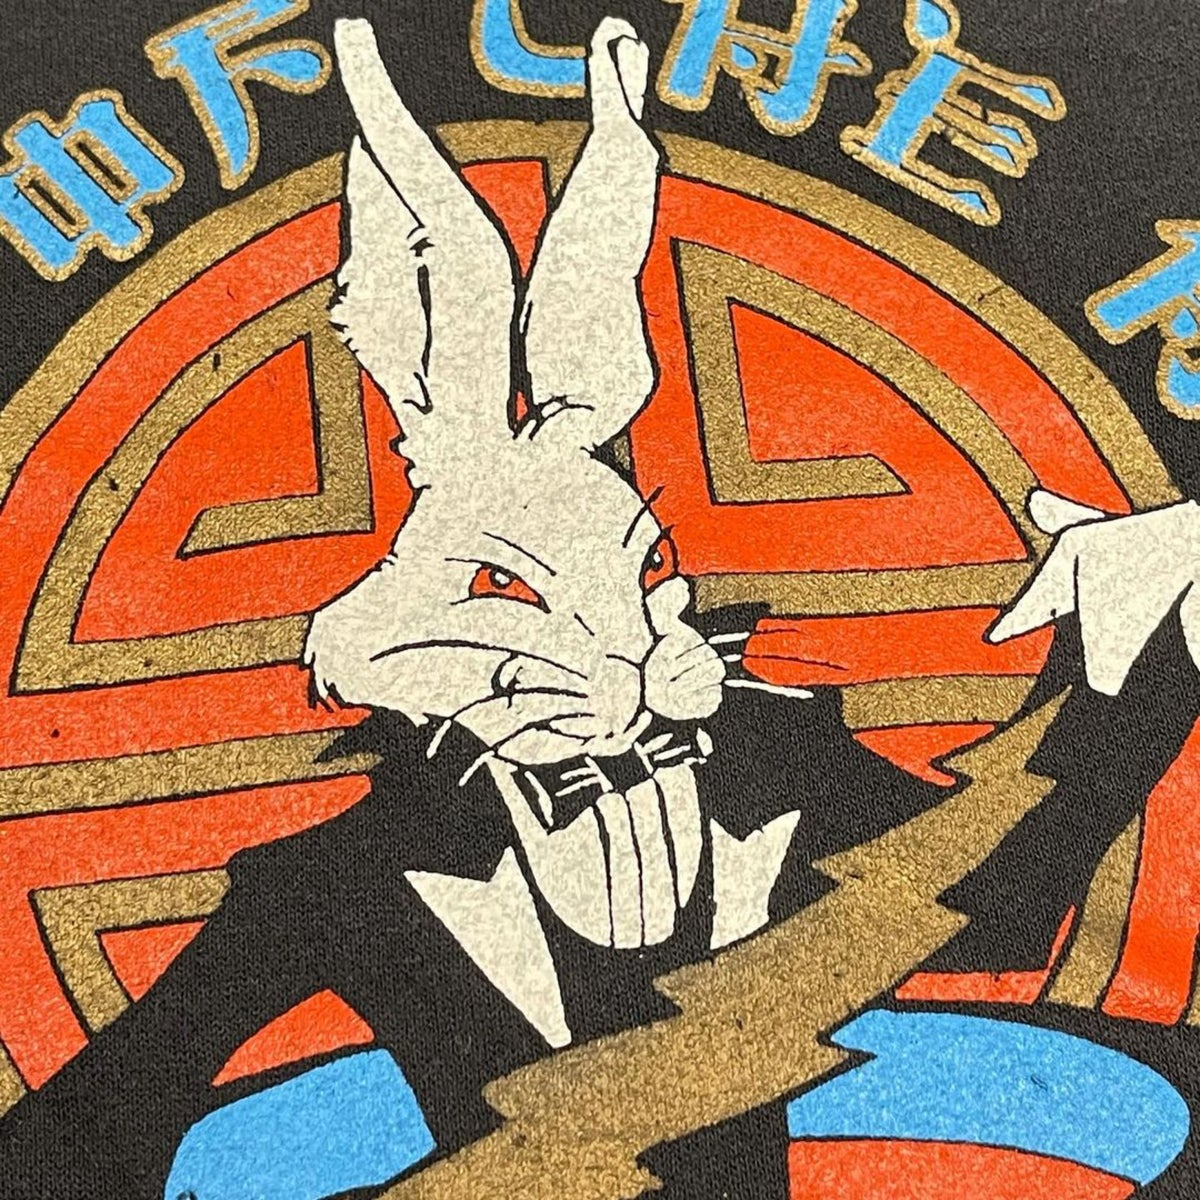 Original Vintage Grateful Dead Chinese New Year 1987 VERY RARE Sweatshirt! - LARGE